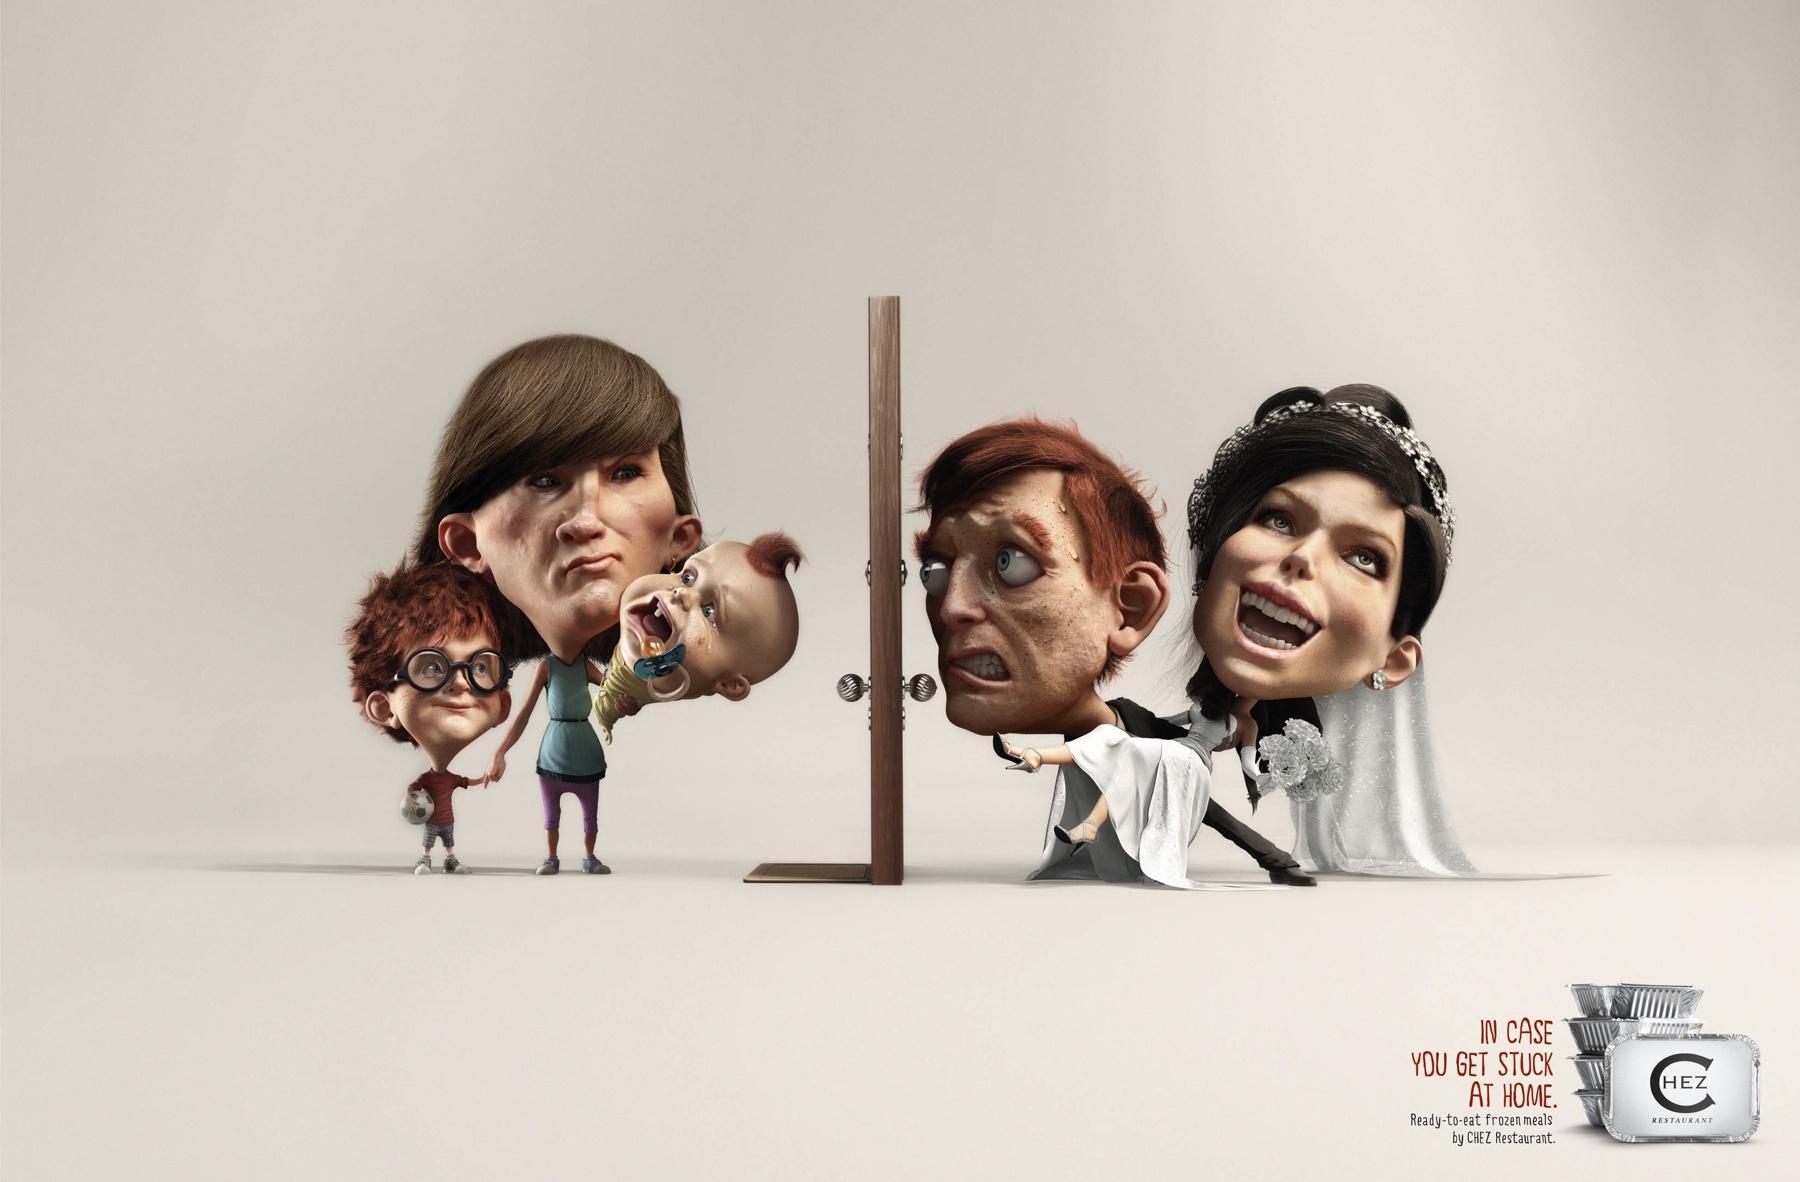 Chez Restaurant: Ex vs Bride | Ads of the World™ #273485 on Wookmark